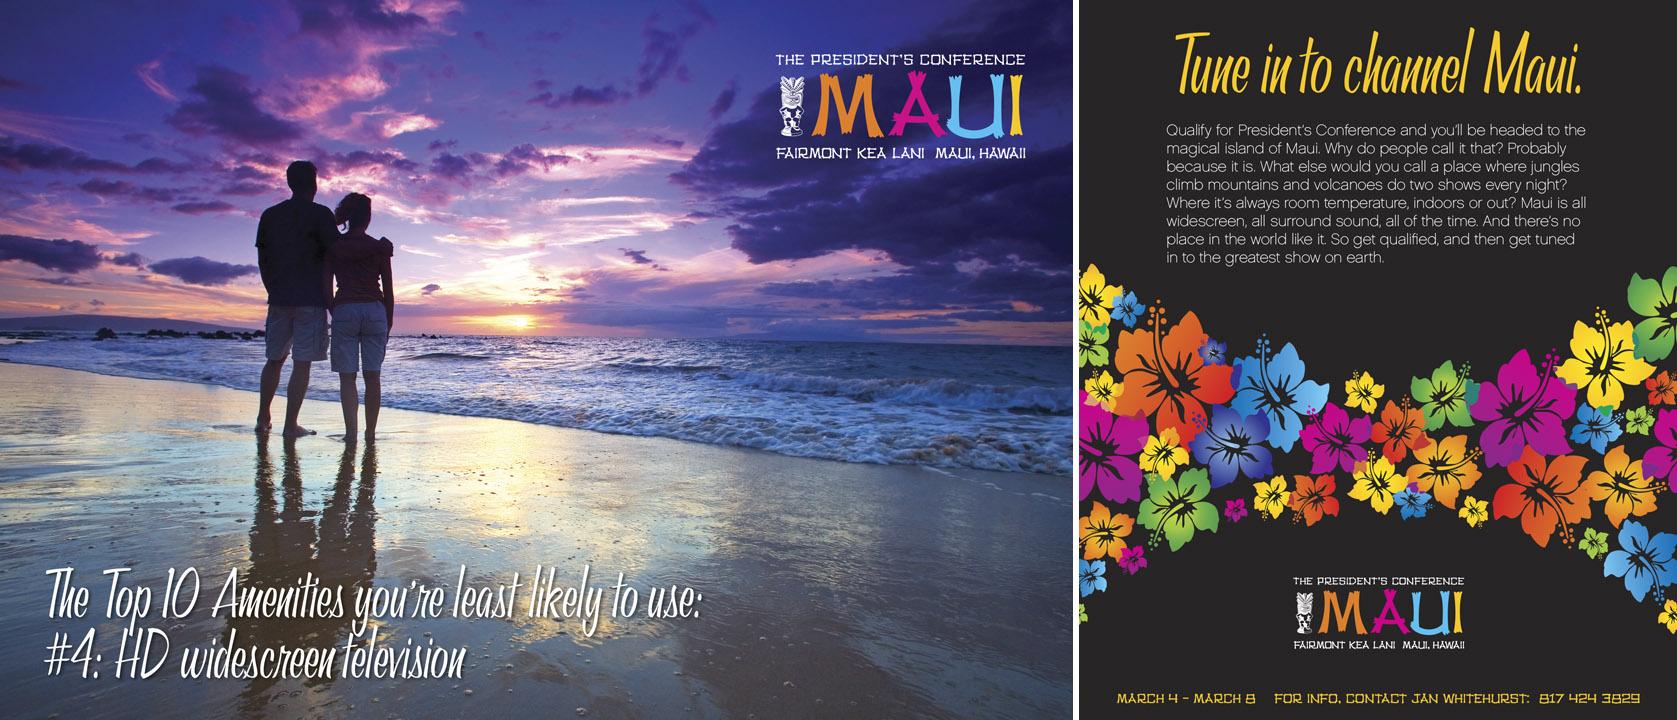 Maui Promo Card 2.jpg